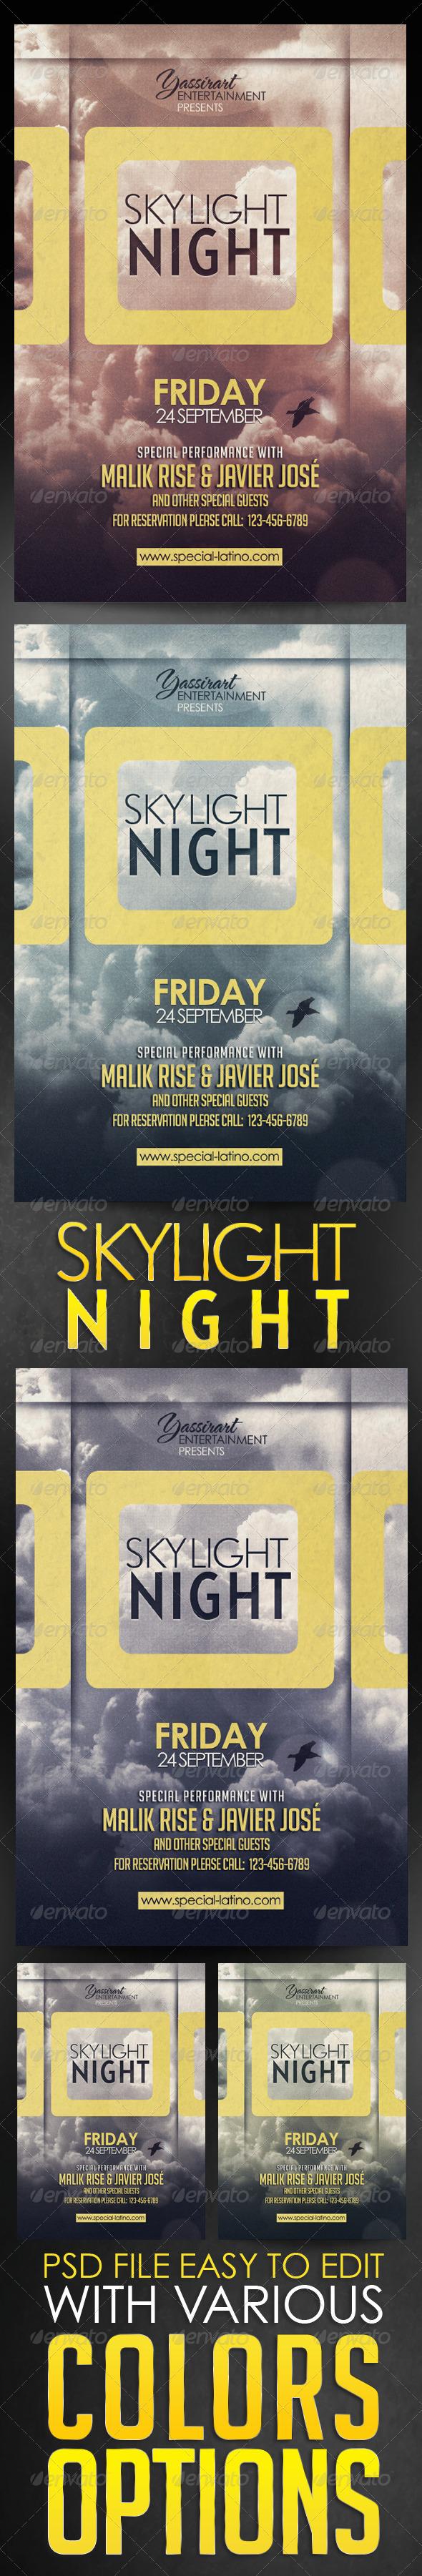 Skylight Night 3 | GraphicRiver